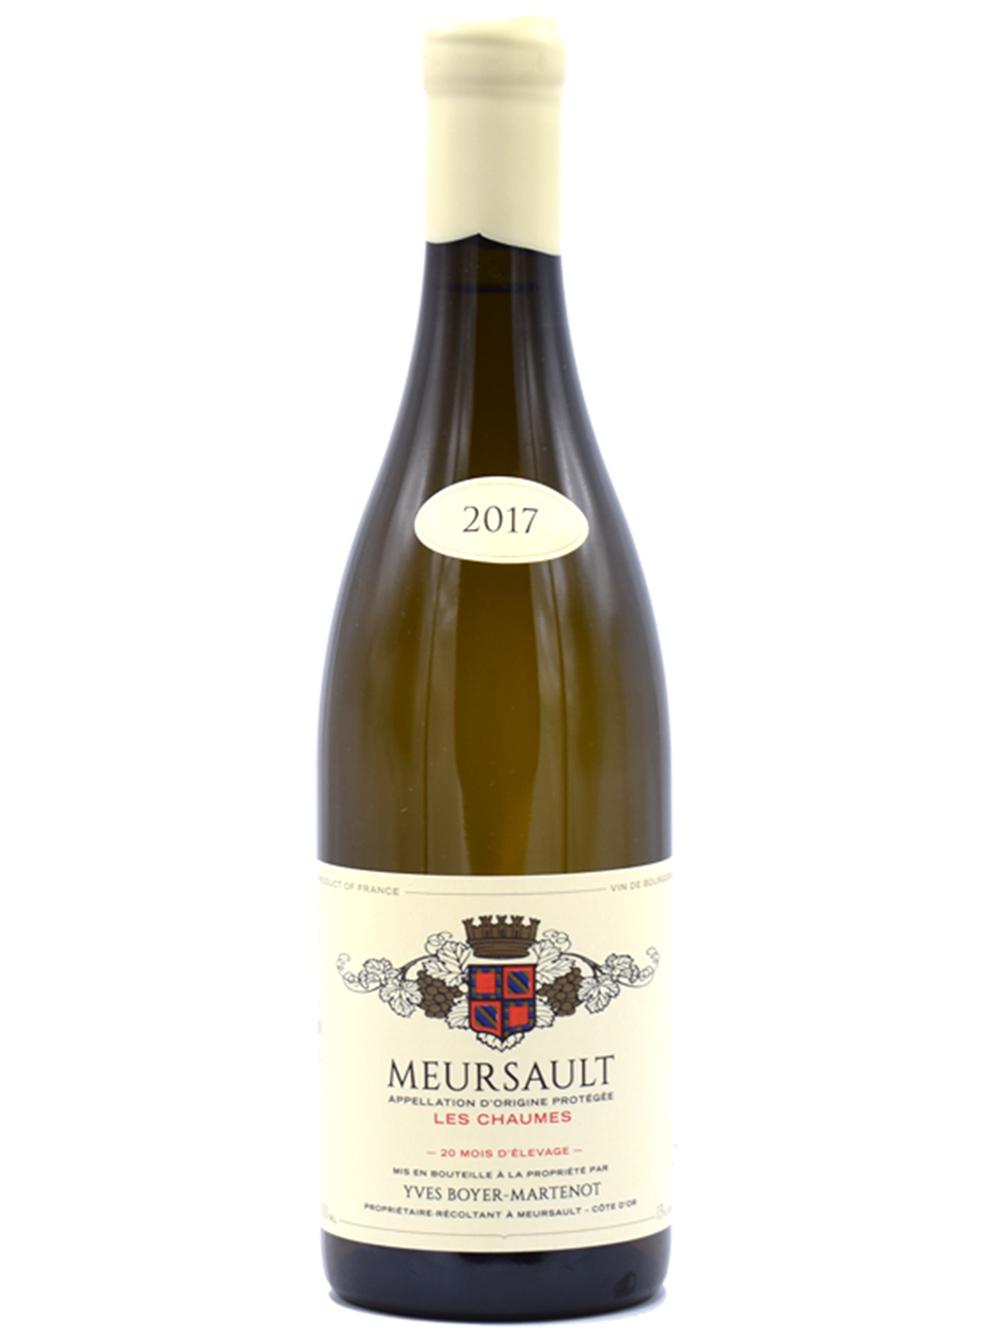 Meursault Les Chaumes